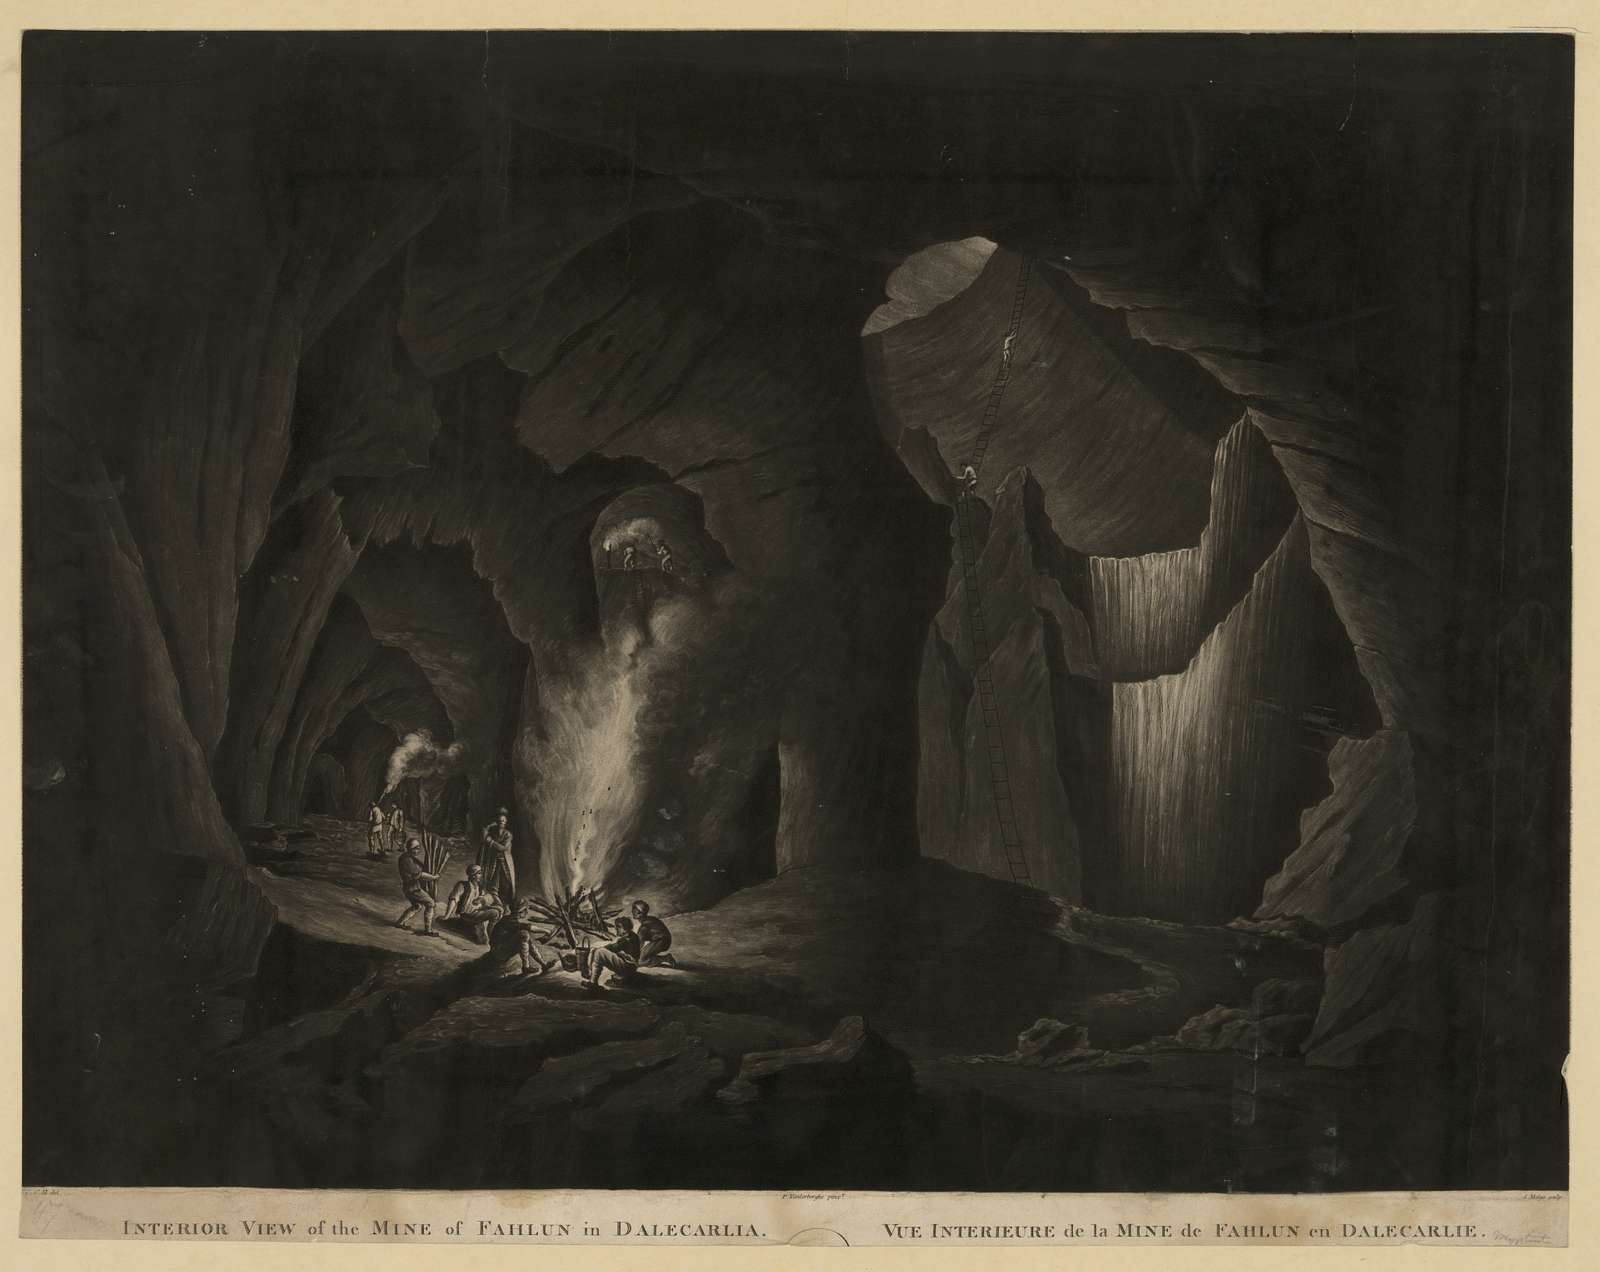 Interior view of the mine of Fahlun in Dalecarlia